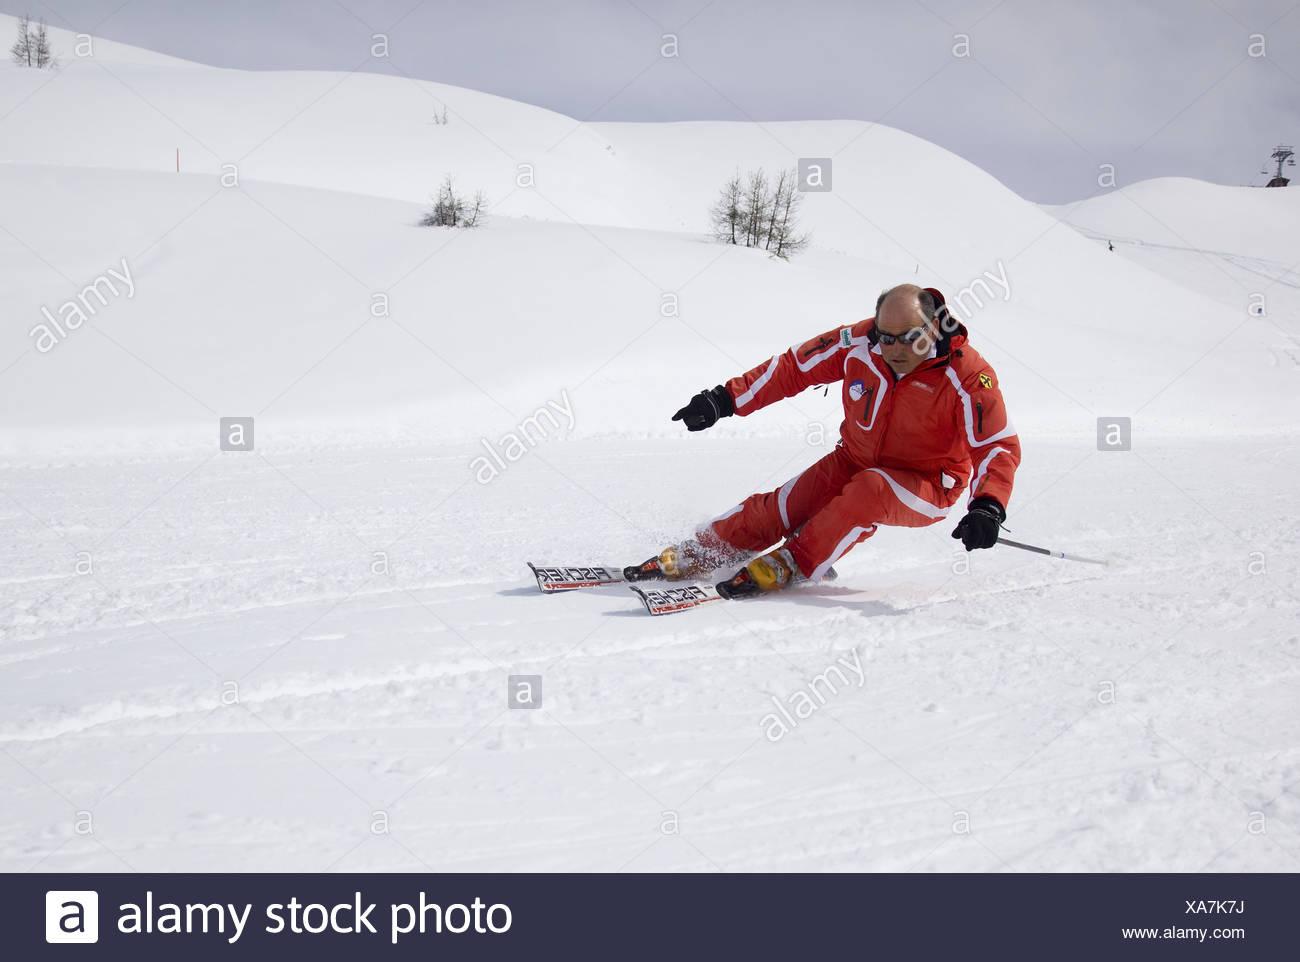 Skiing - Stock Image